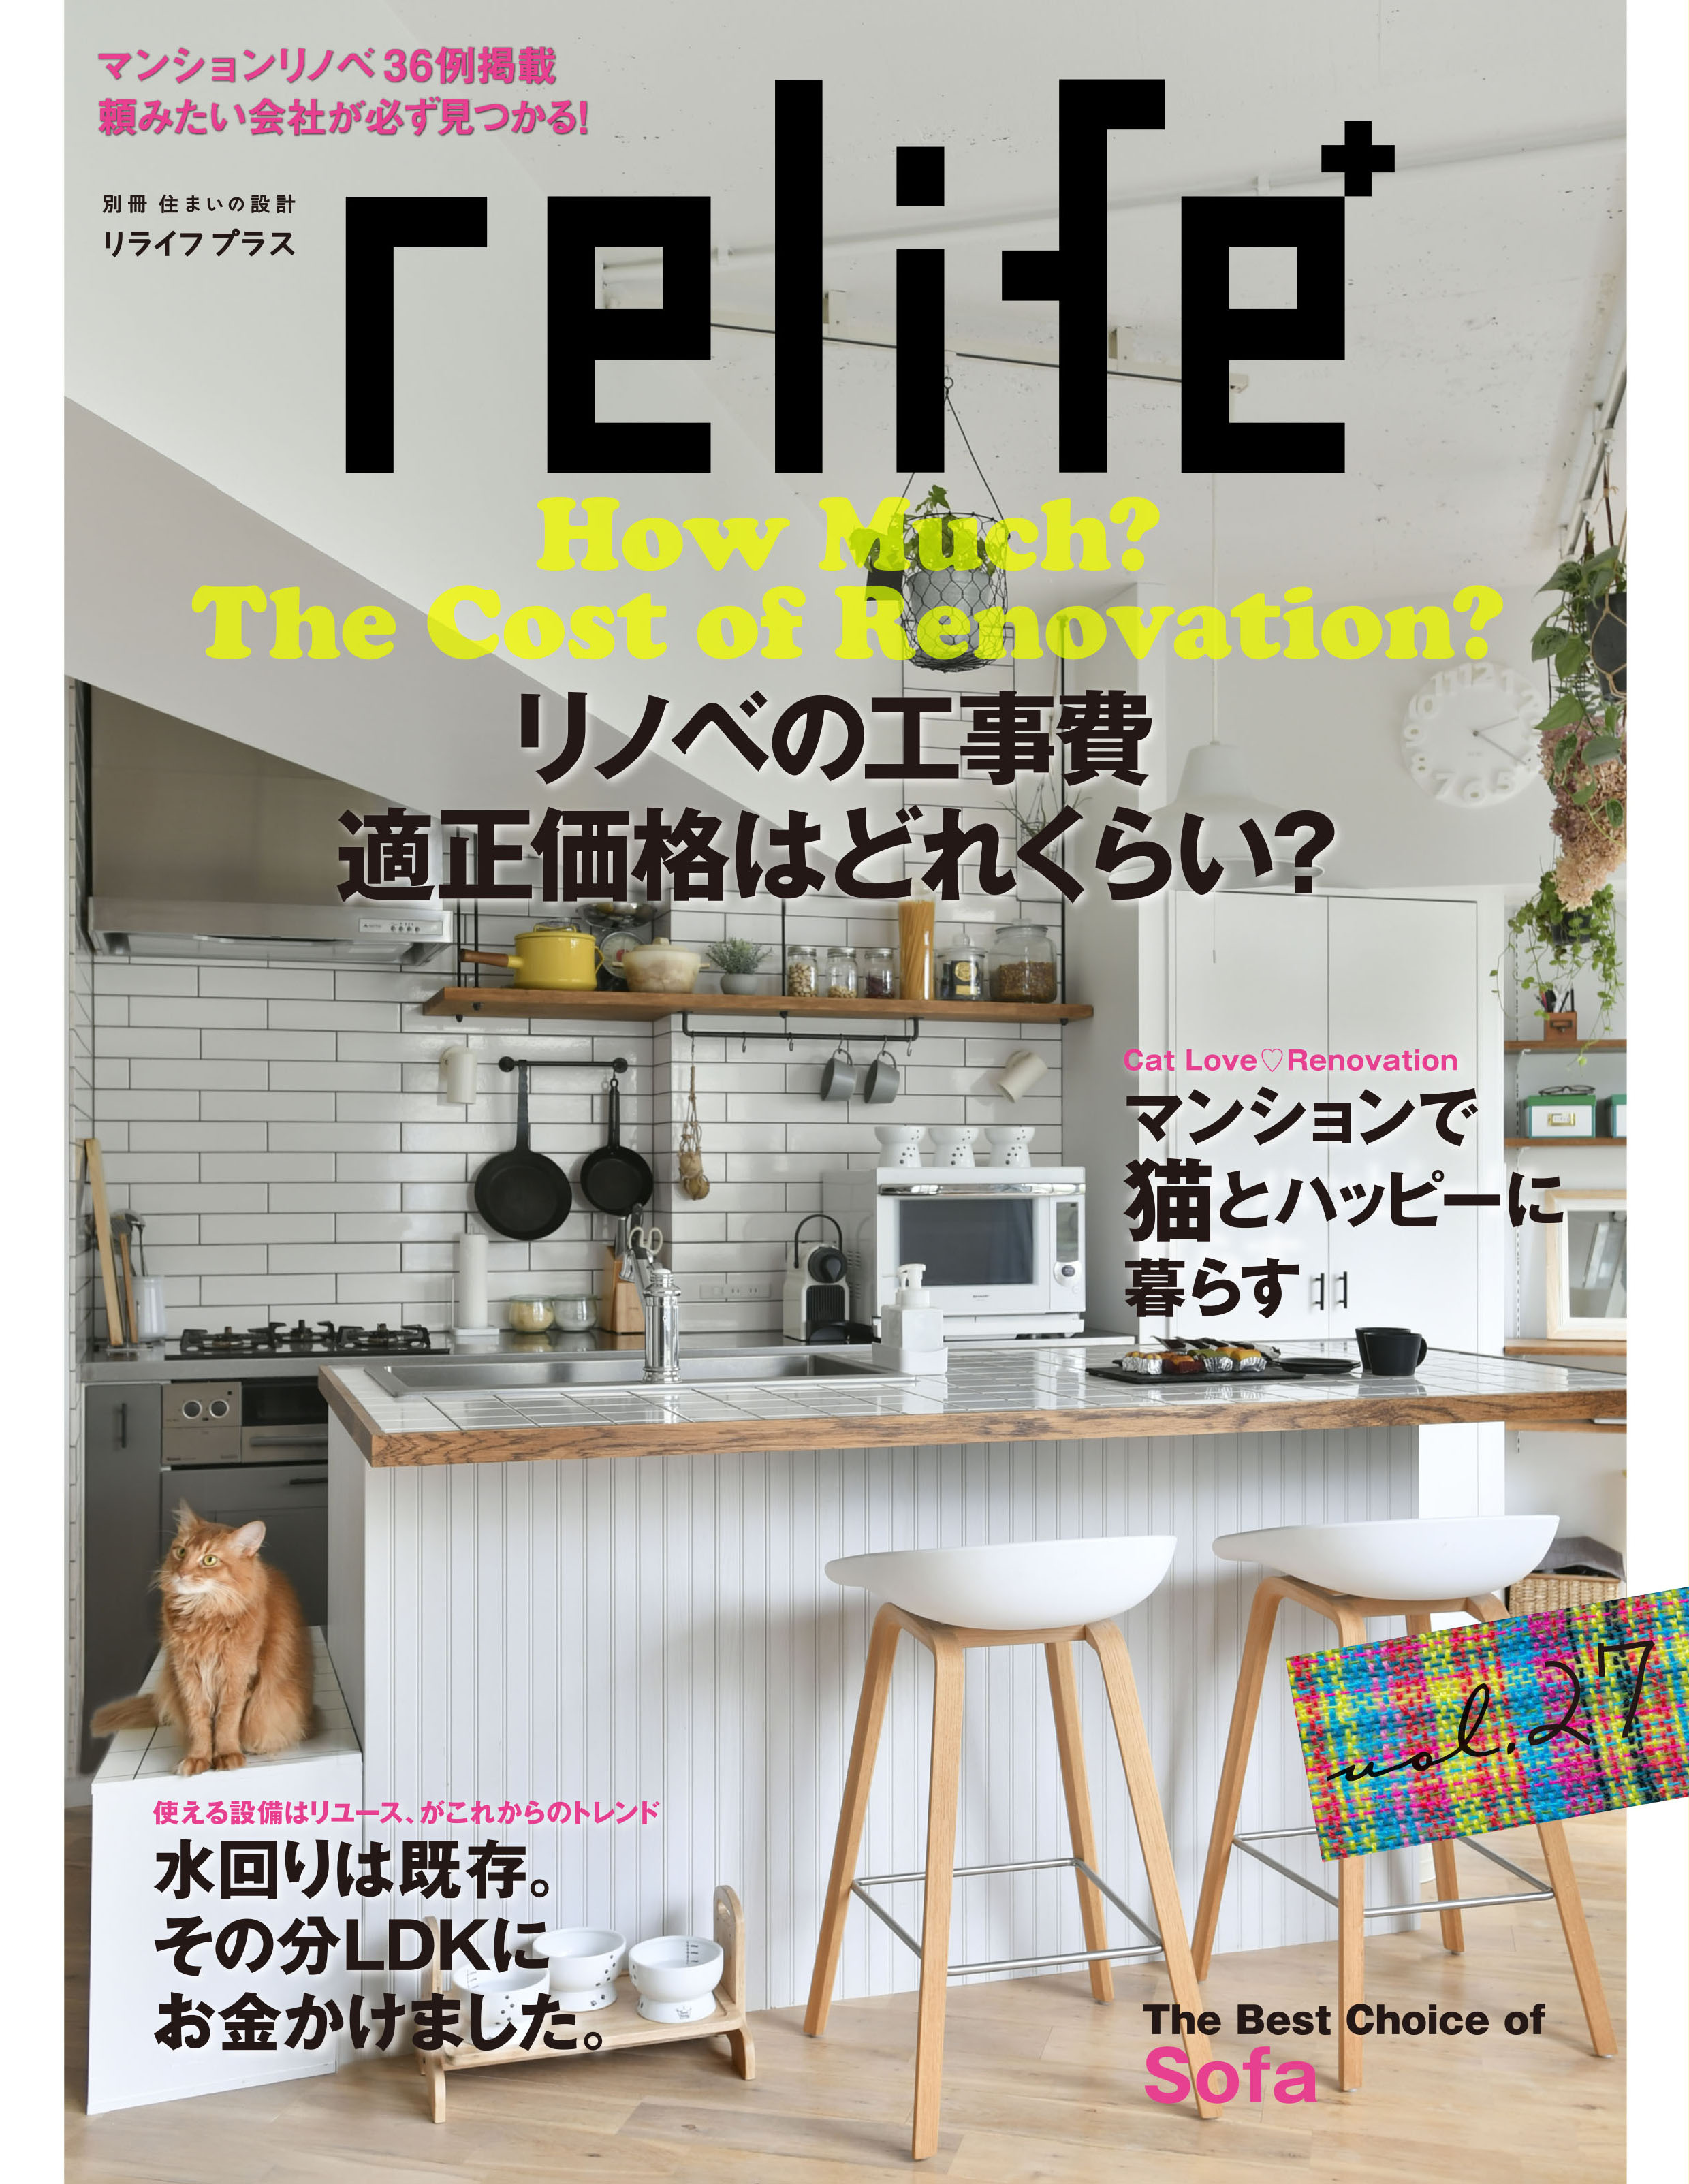 記事掲載:雑誌「relife+ vol.27」!